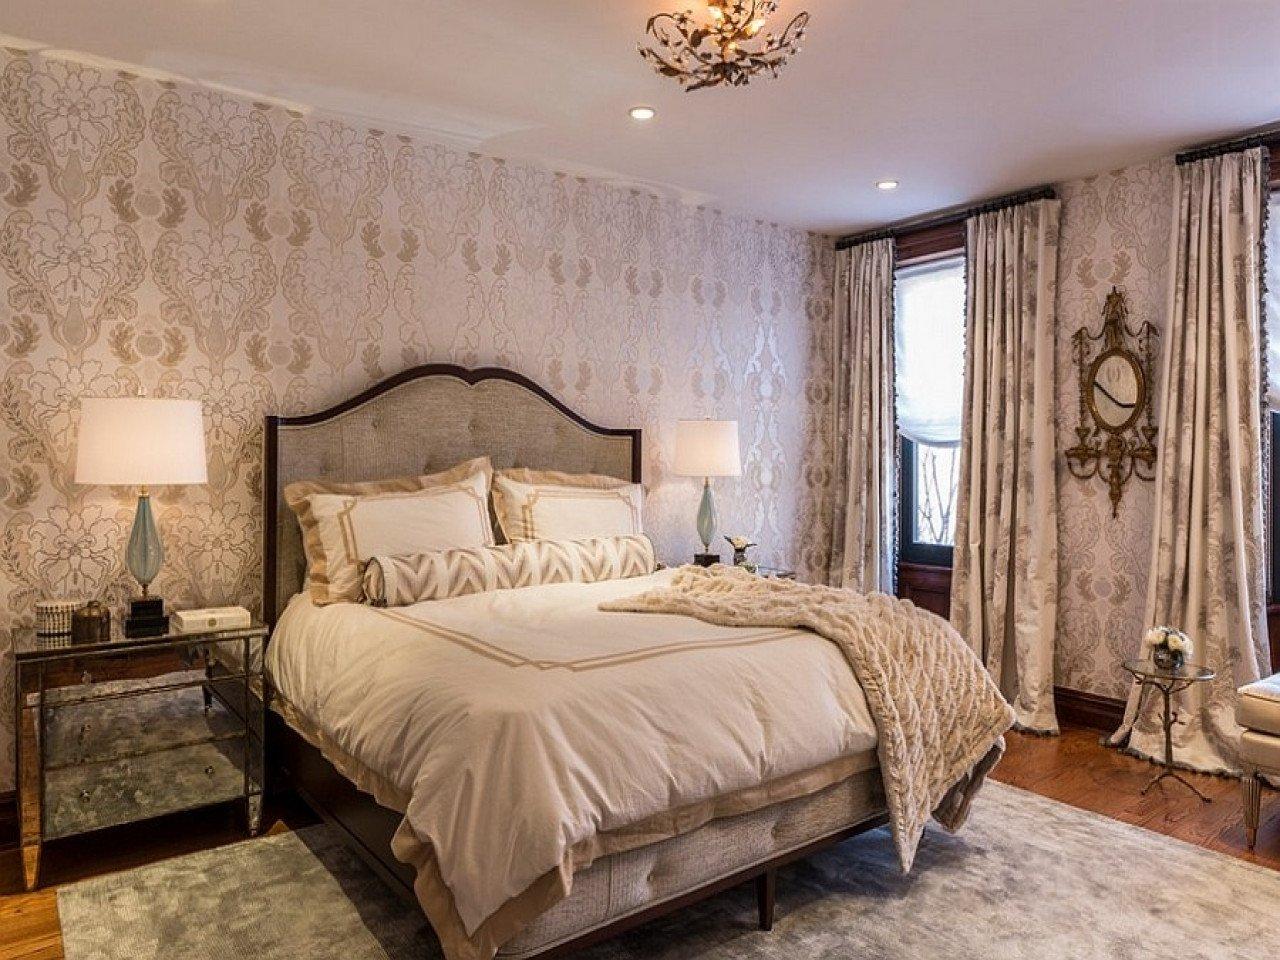 New York City Bedroom Decor Luxury New York Bedroom Designs Nyc themed Bedding New York Style Bedroom Decor Bedroom Designs